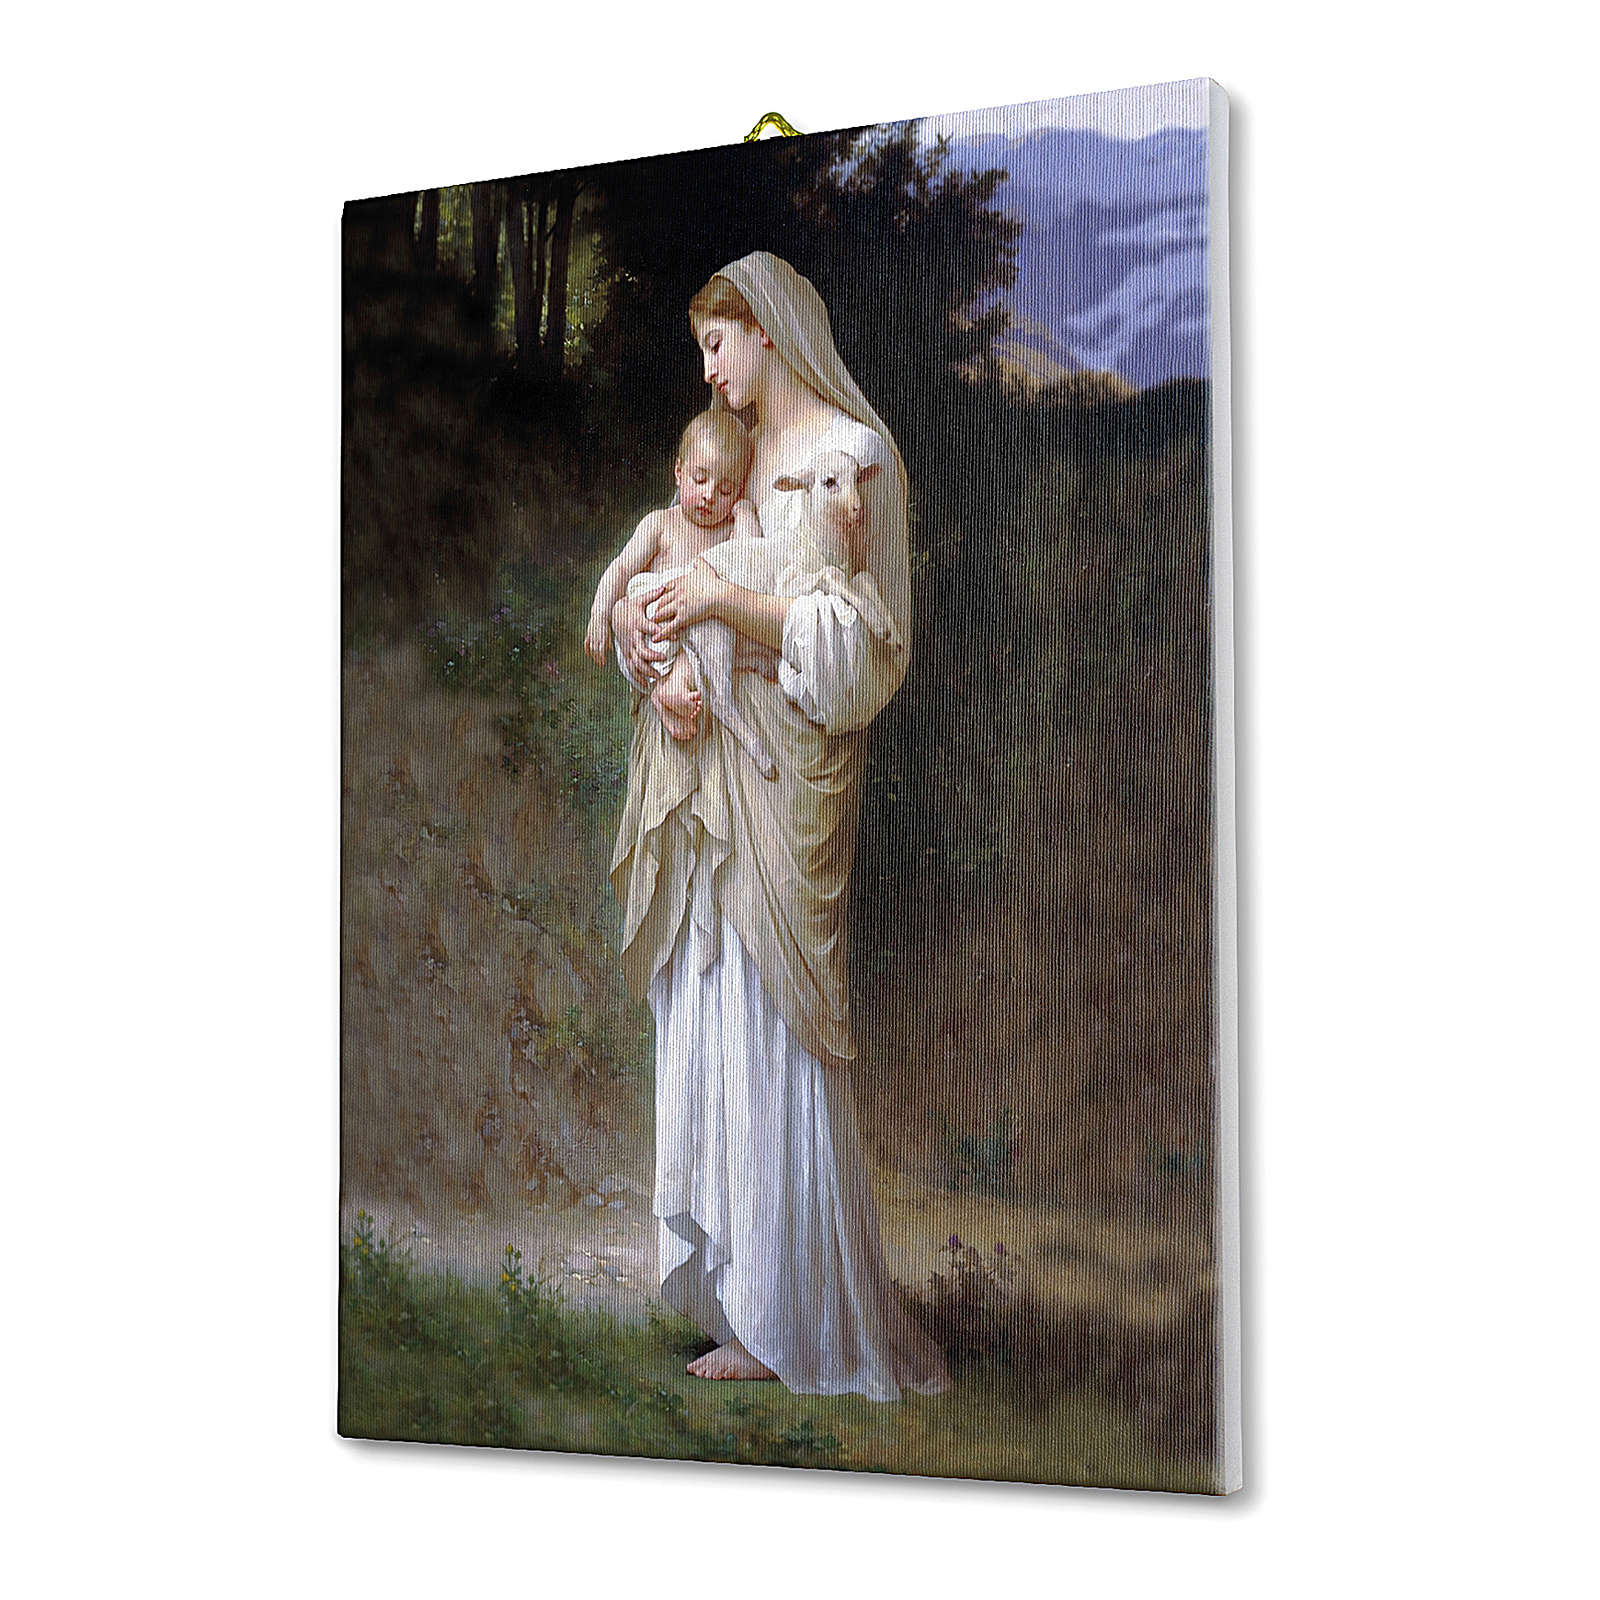 Quadro su tela pittorica Divina Innocenza di Bouguereau 70x50 cm 3